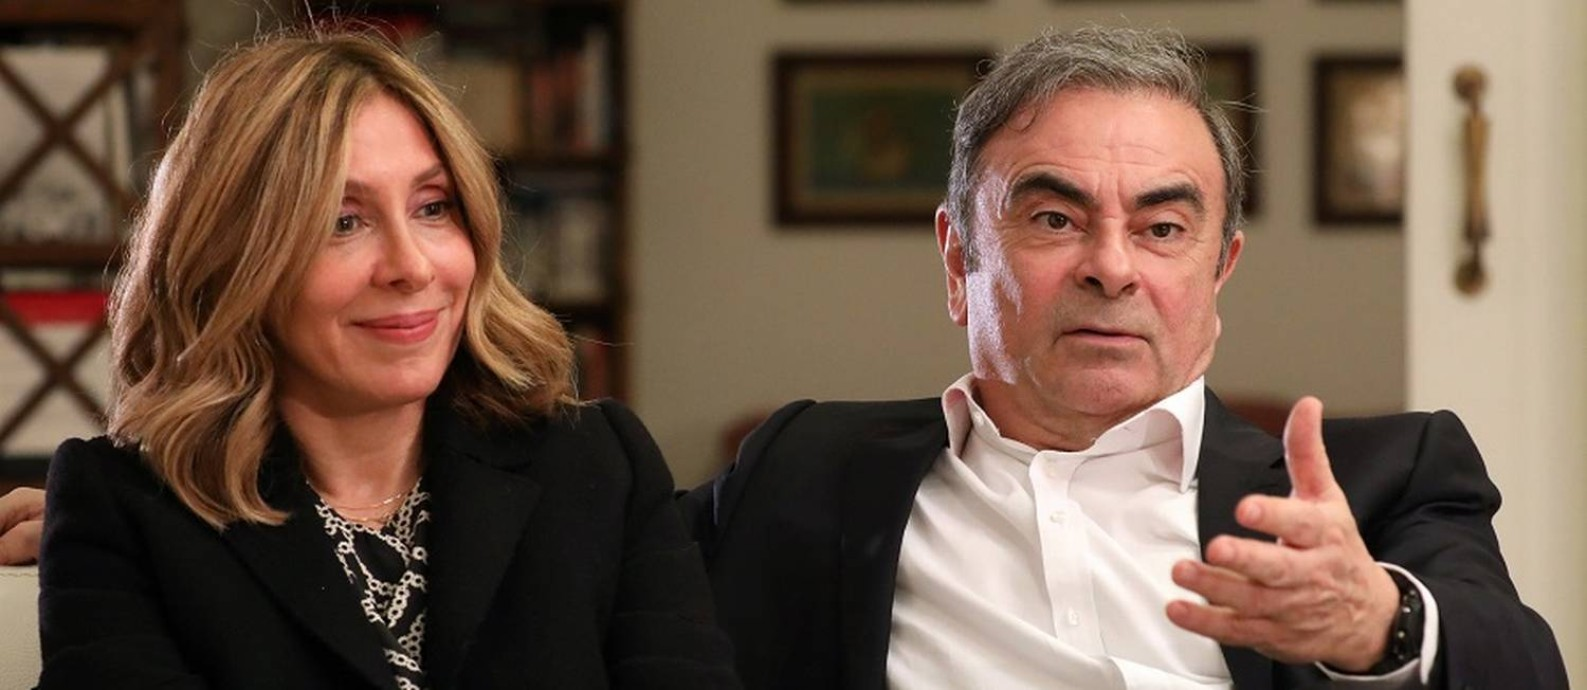 Carole e Carlos Ghosn em Beirute. Foto: MOHAMED AZAKIR / REUTERS